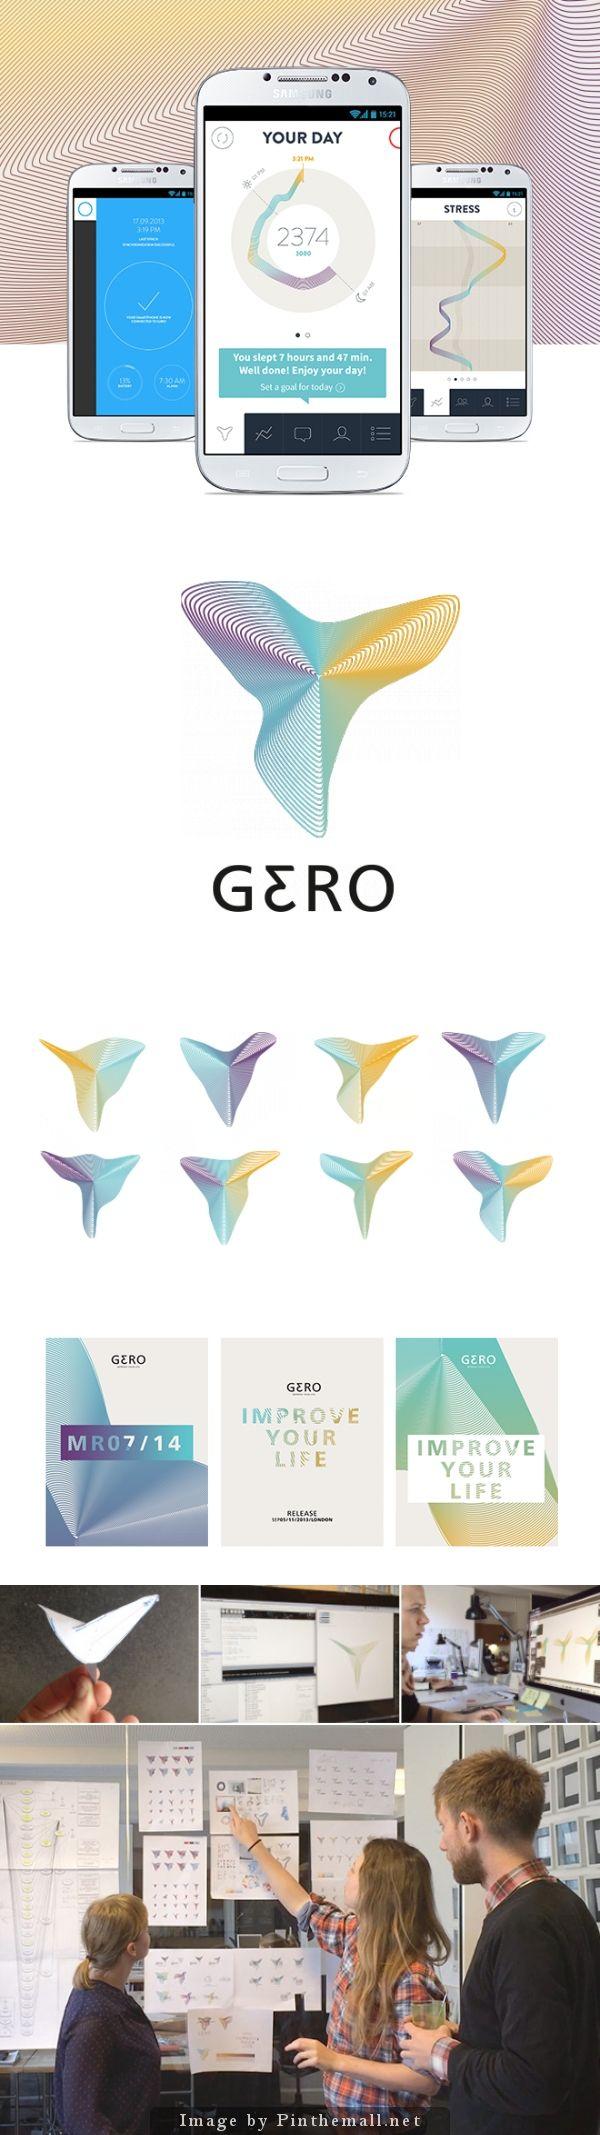 think moto – Flexible identity for GERO